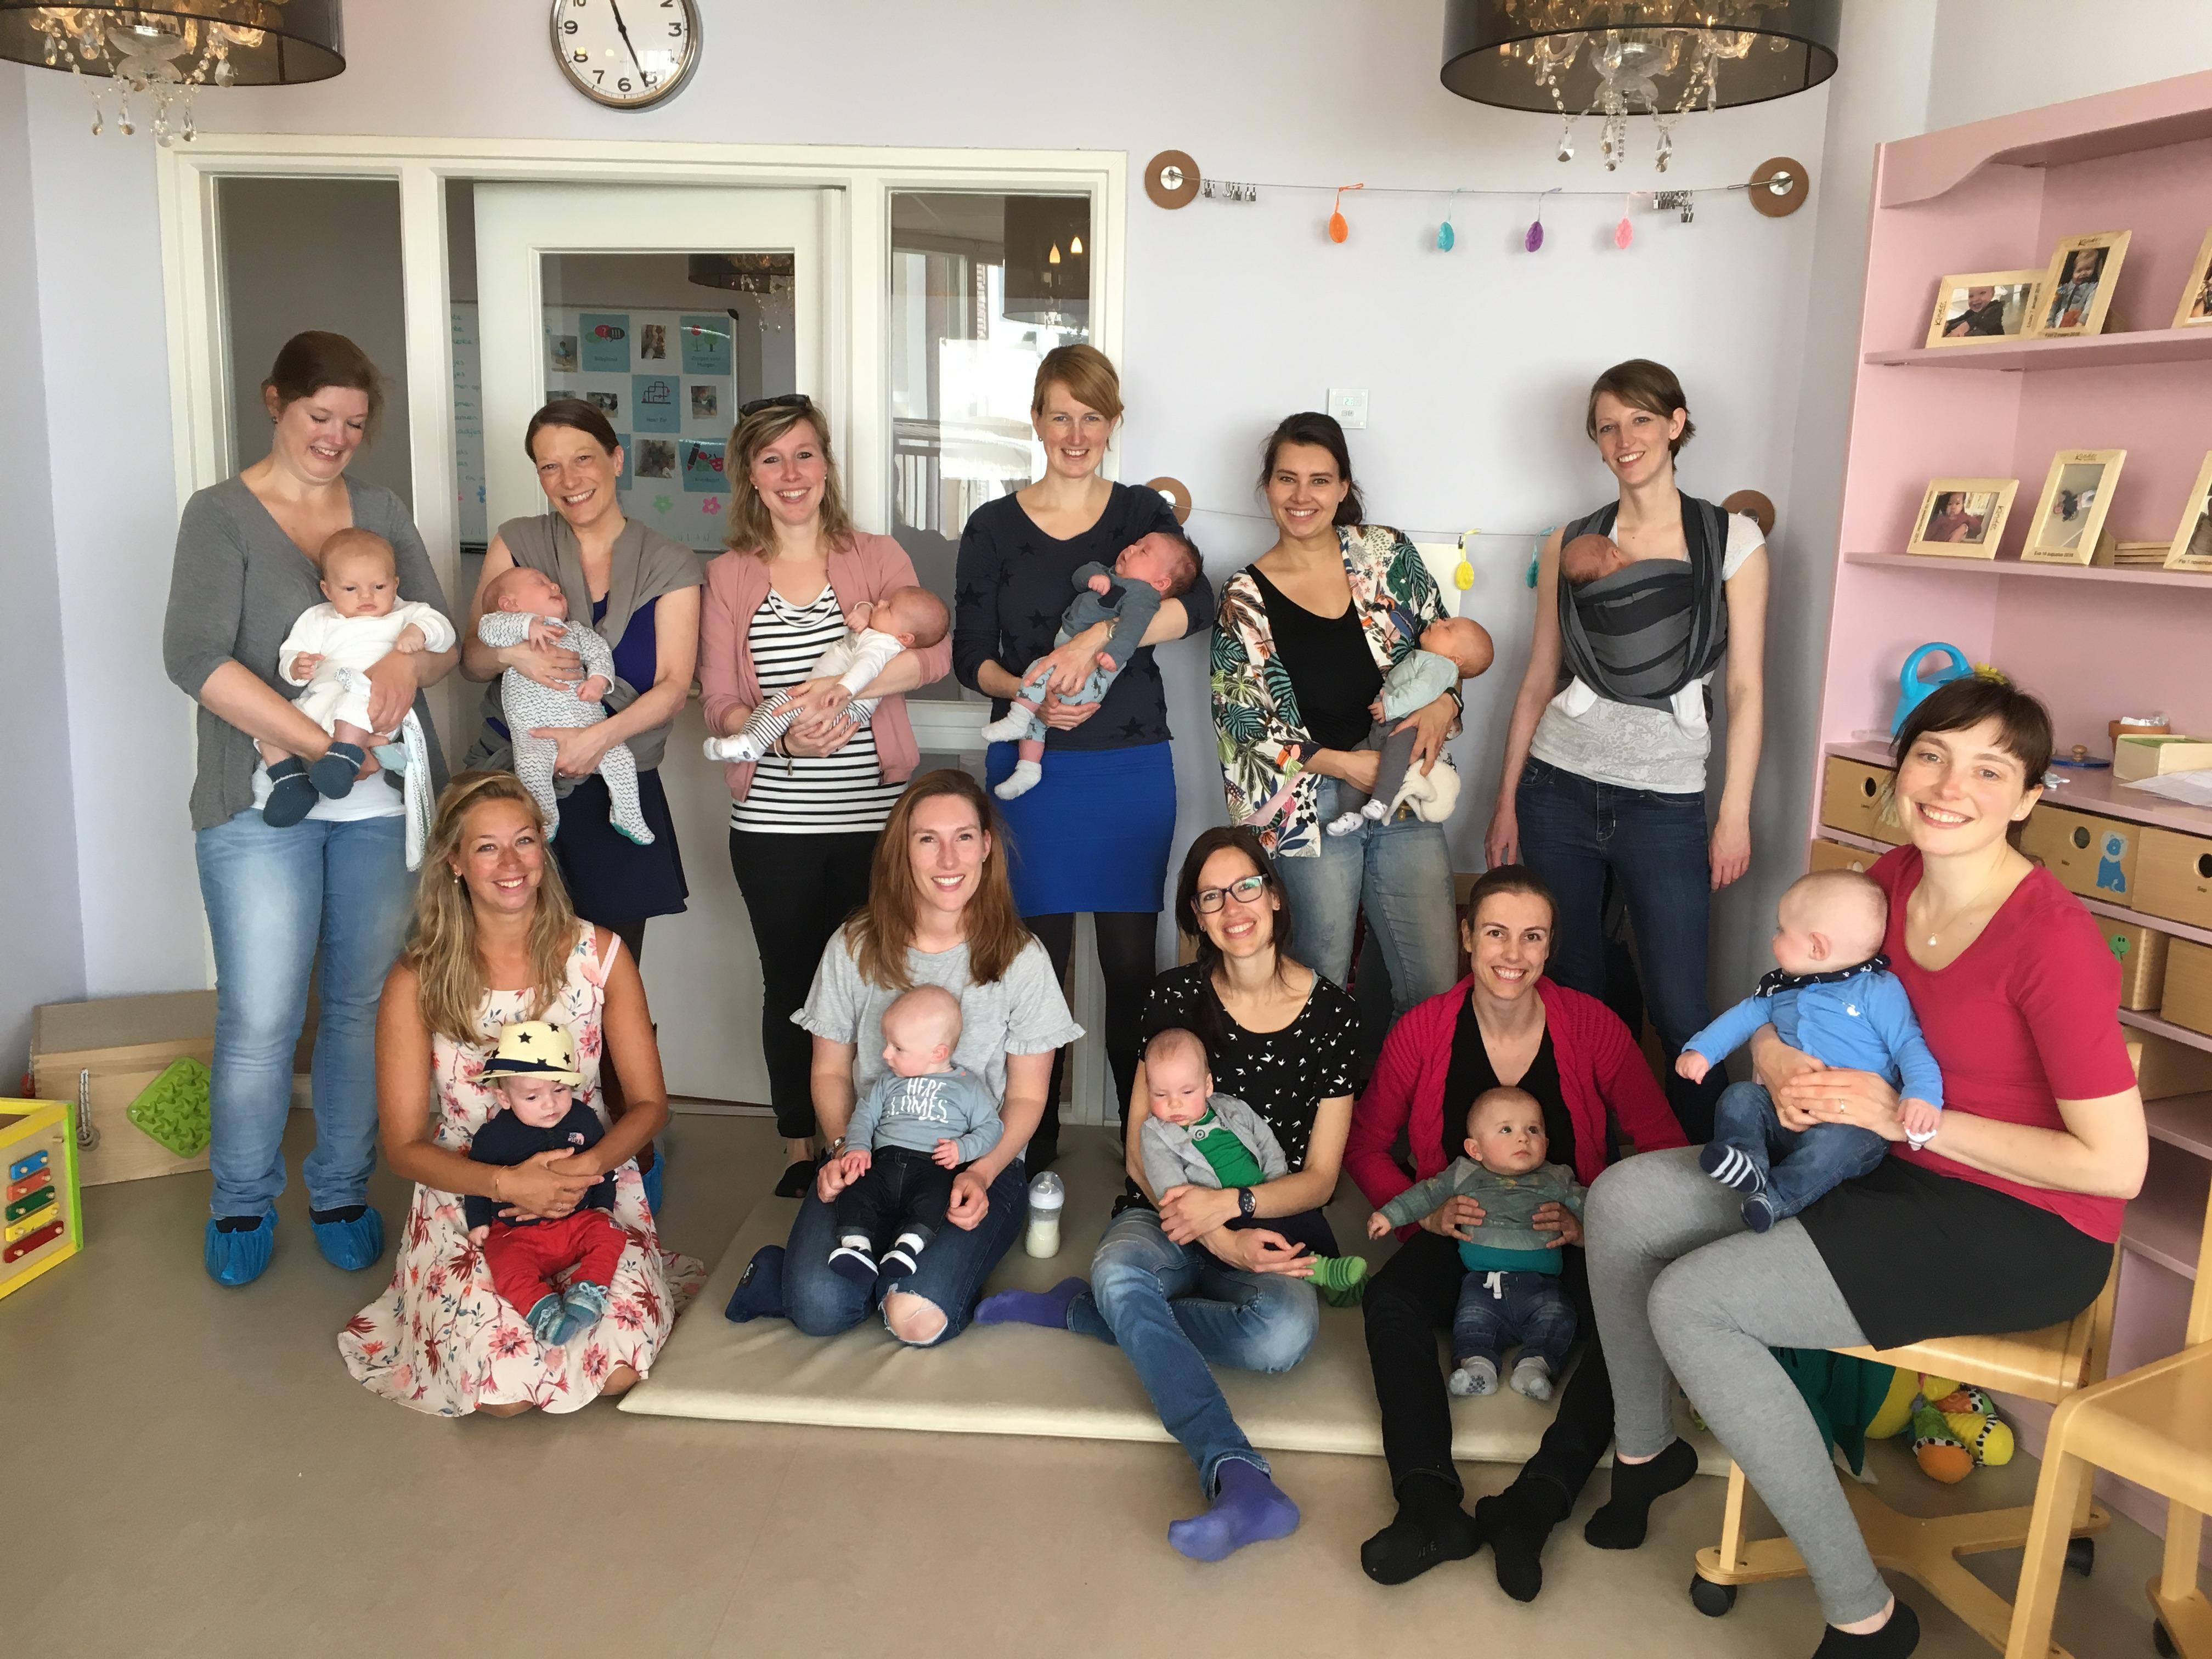 Terugkombijeenkomst zwangerschapsyoga